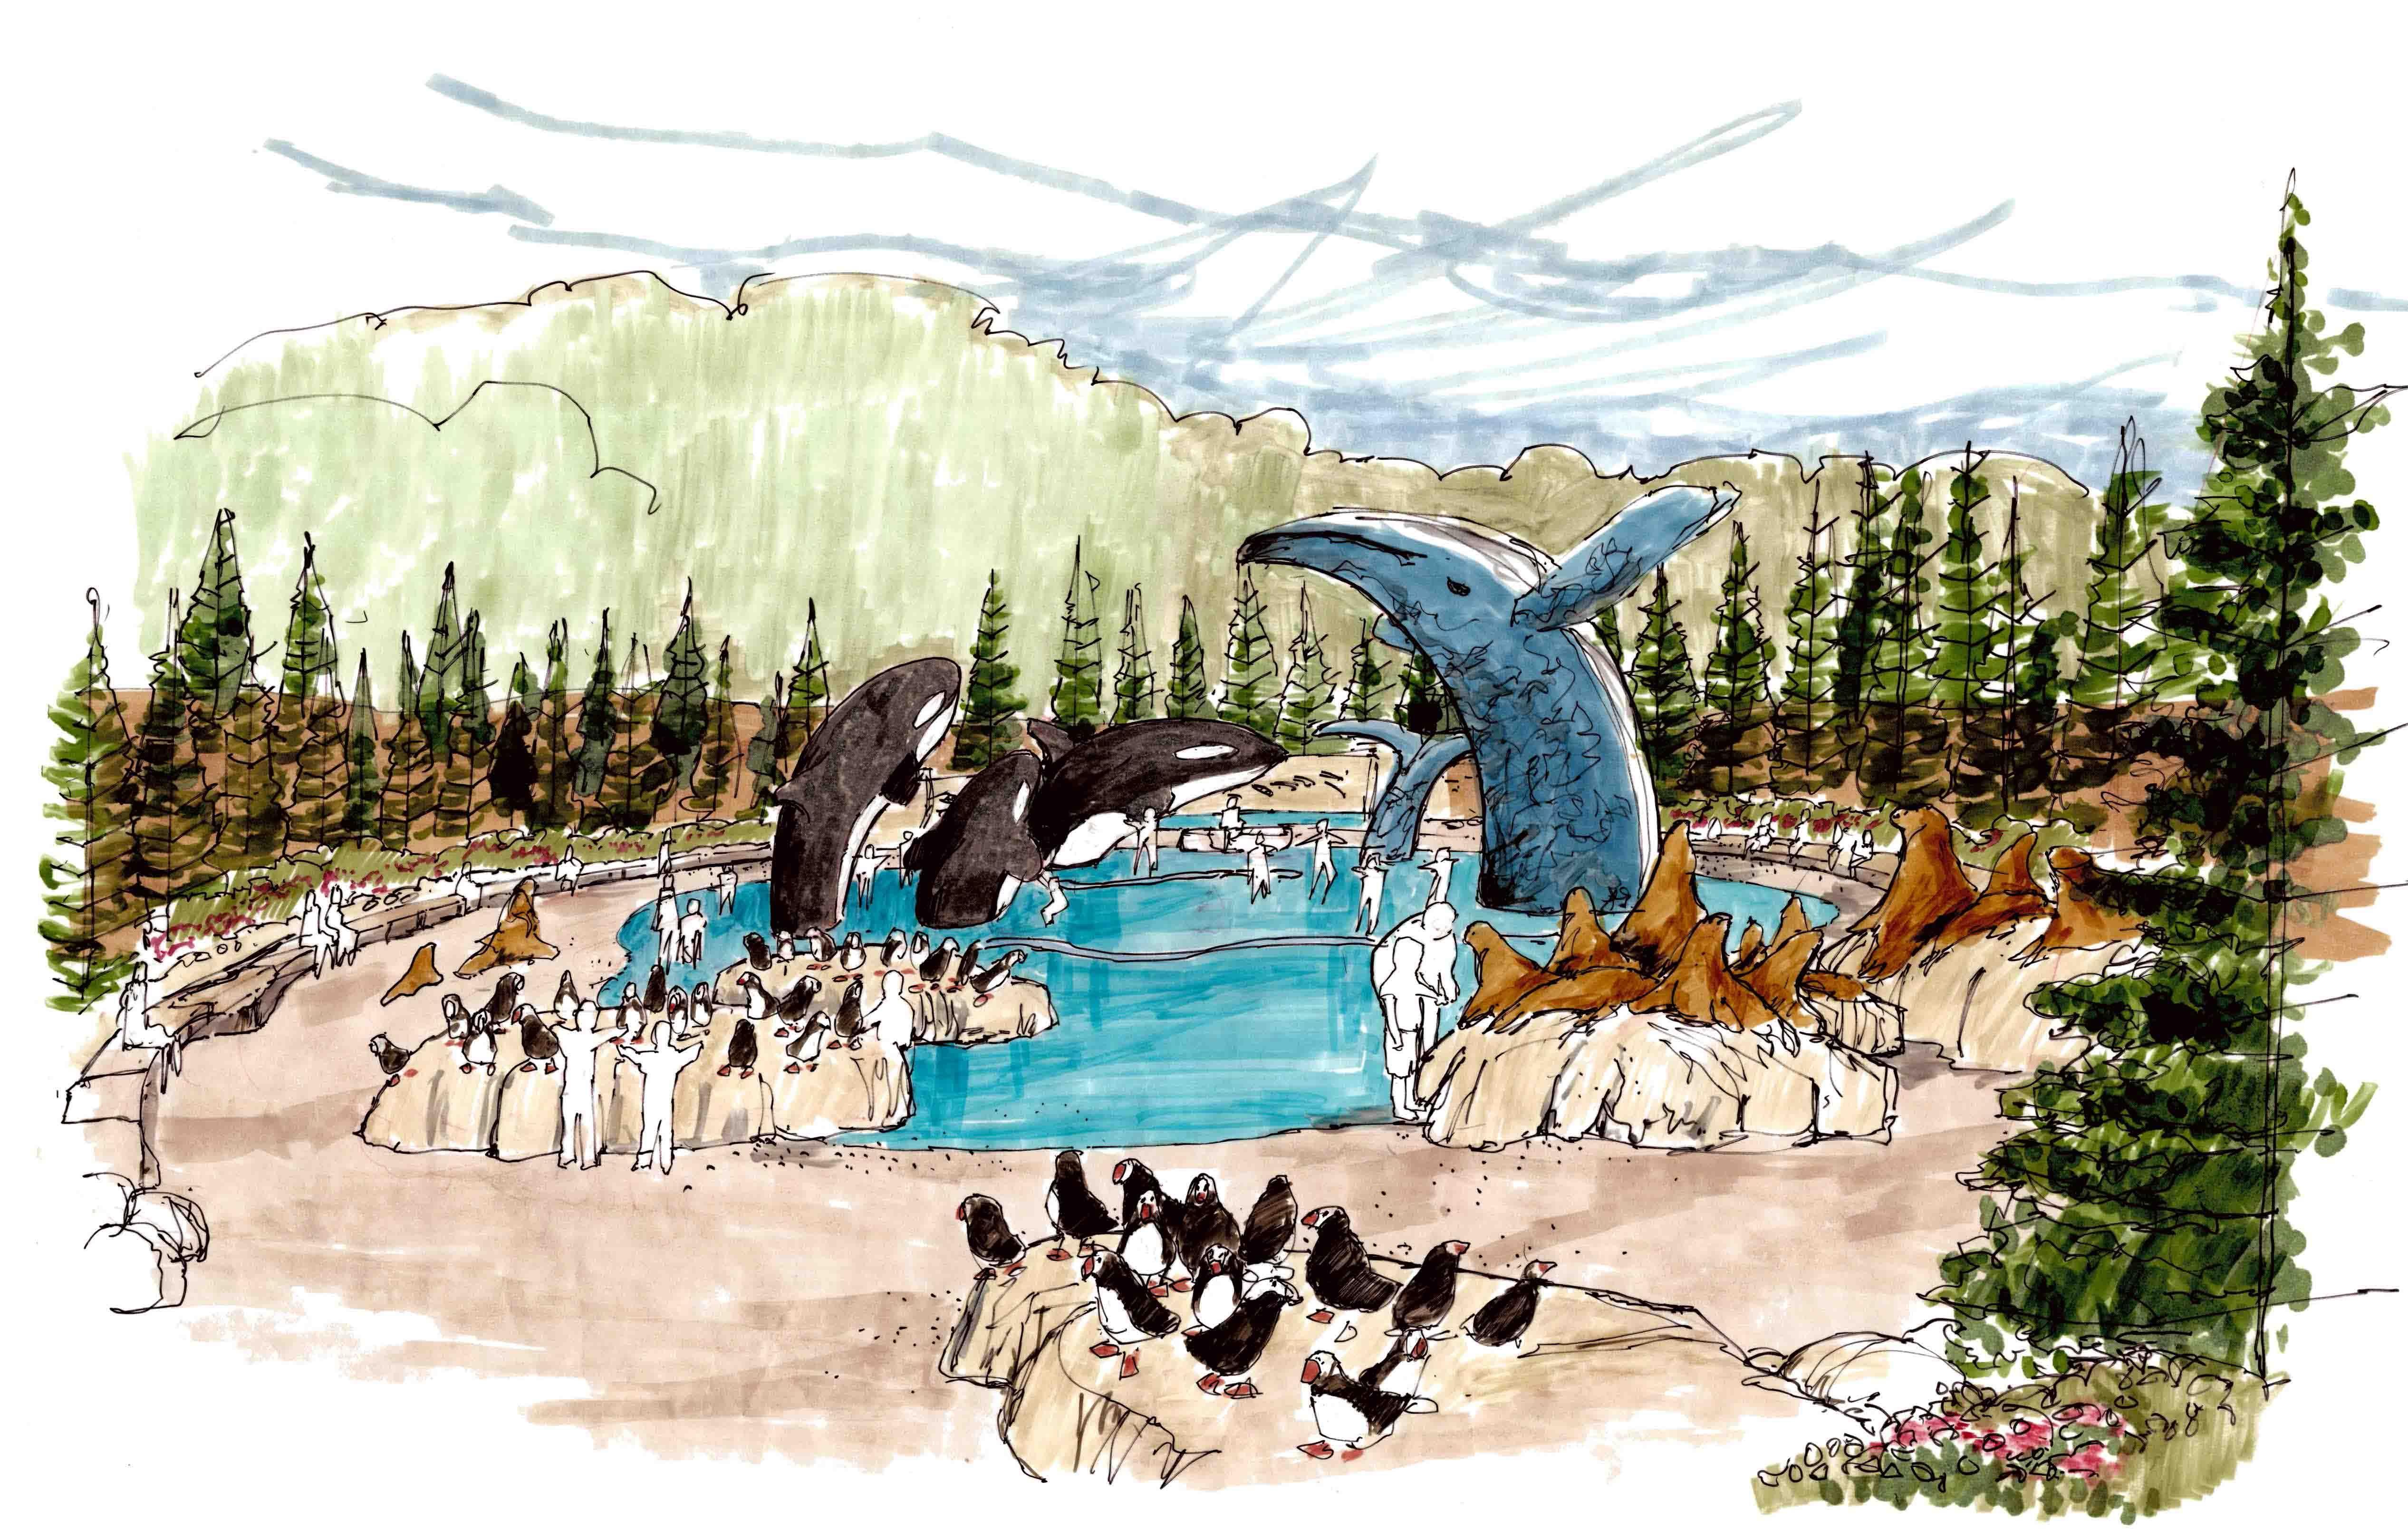 News/About   Omahau0027s Henry Doorly Zoo   News u0026 History of Omahau0027s Henry Doorly  sc 1 st  Pinterest & News/About   Omahau0027s Henry Doorly Zoo   News u0026 History of Omahau0027s ... pezcame.com